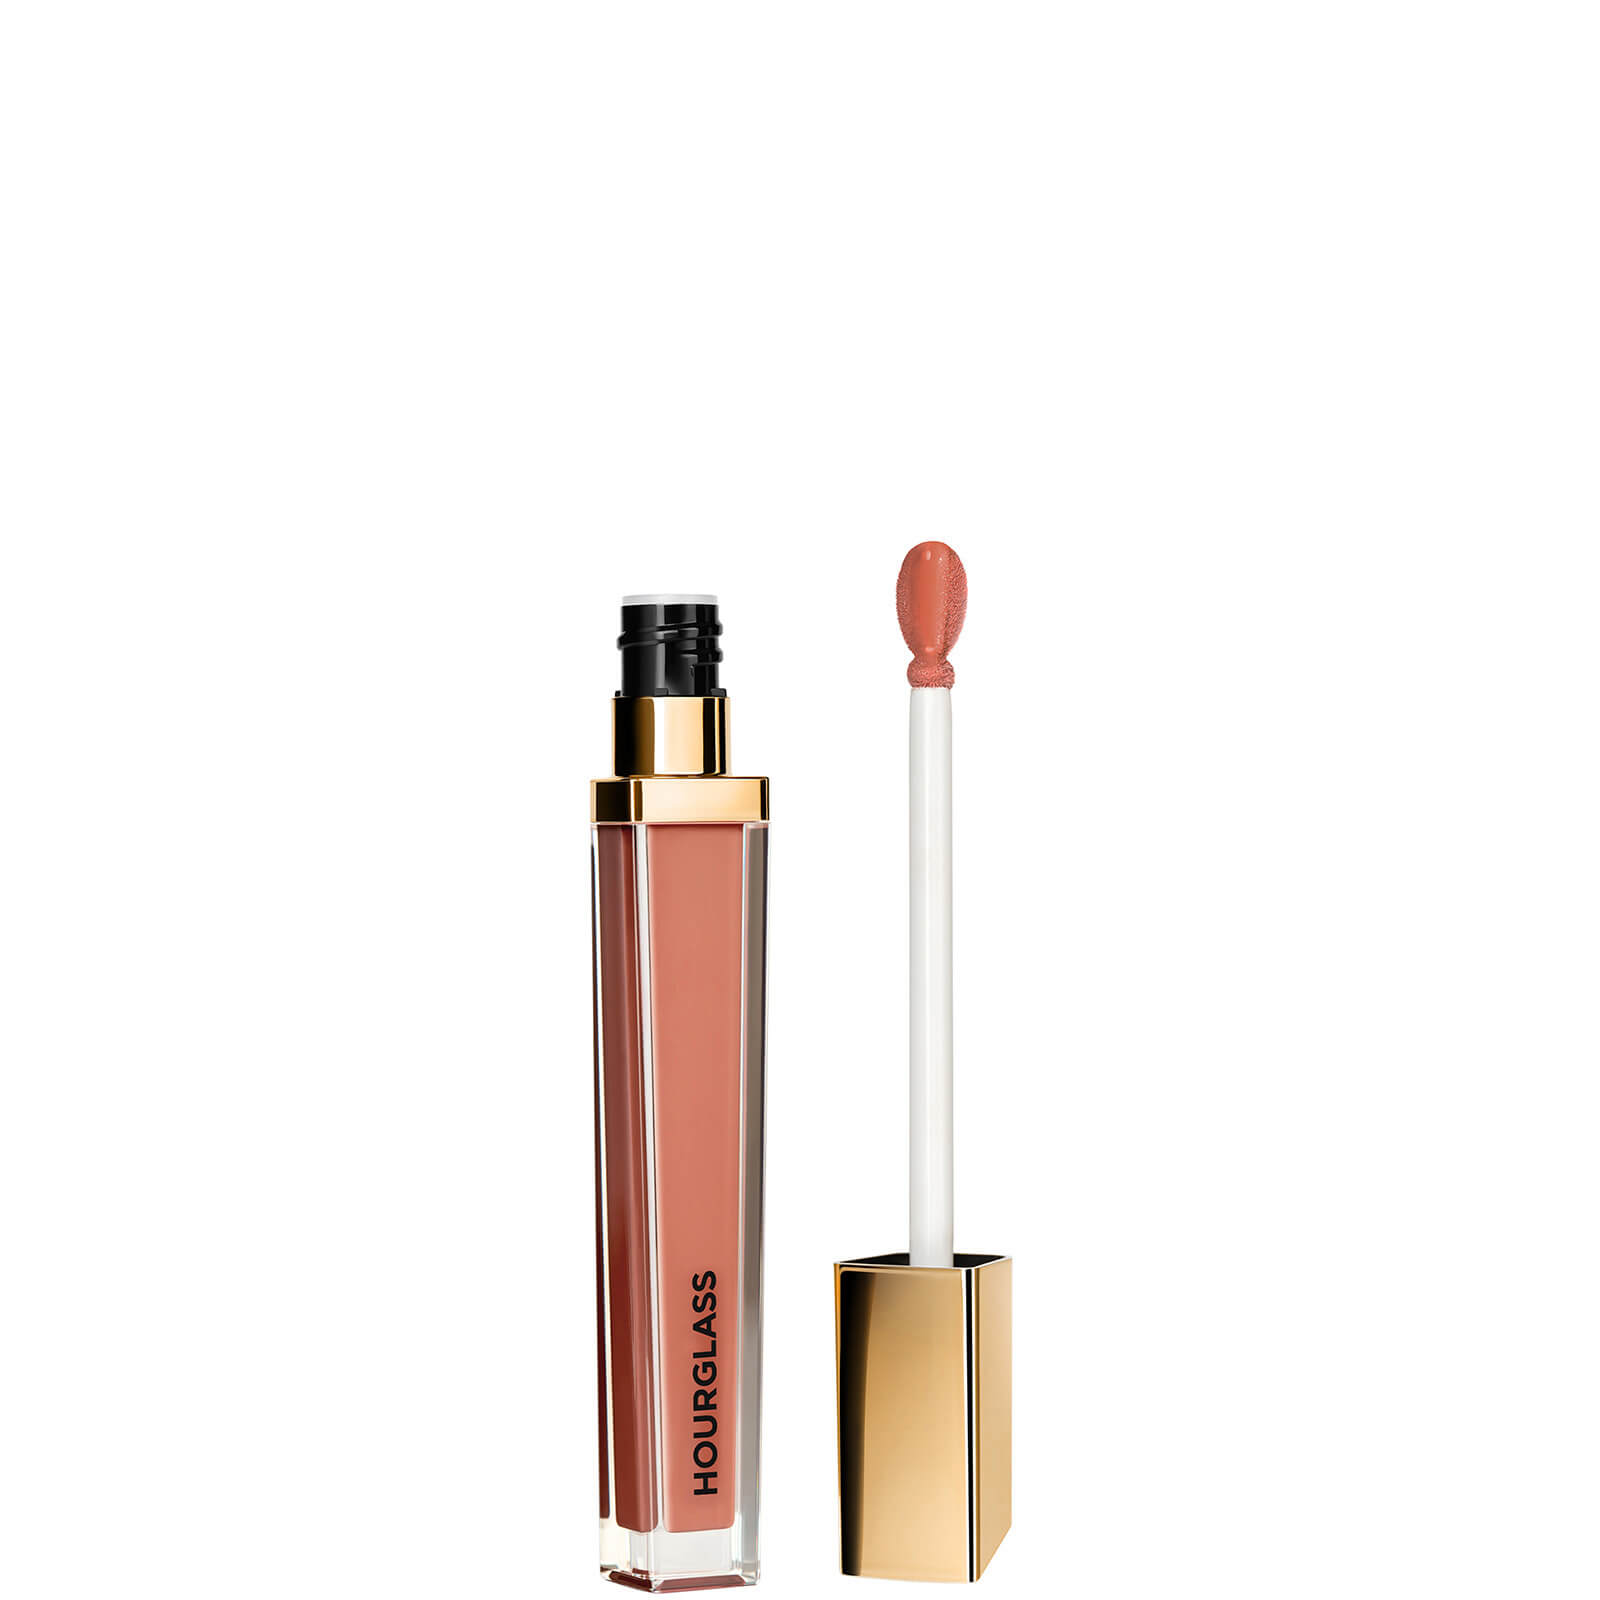 Hourglass Unreal High Shine Volumising Lip Gloss 5.6g (Various Shades) - Truth